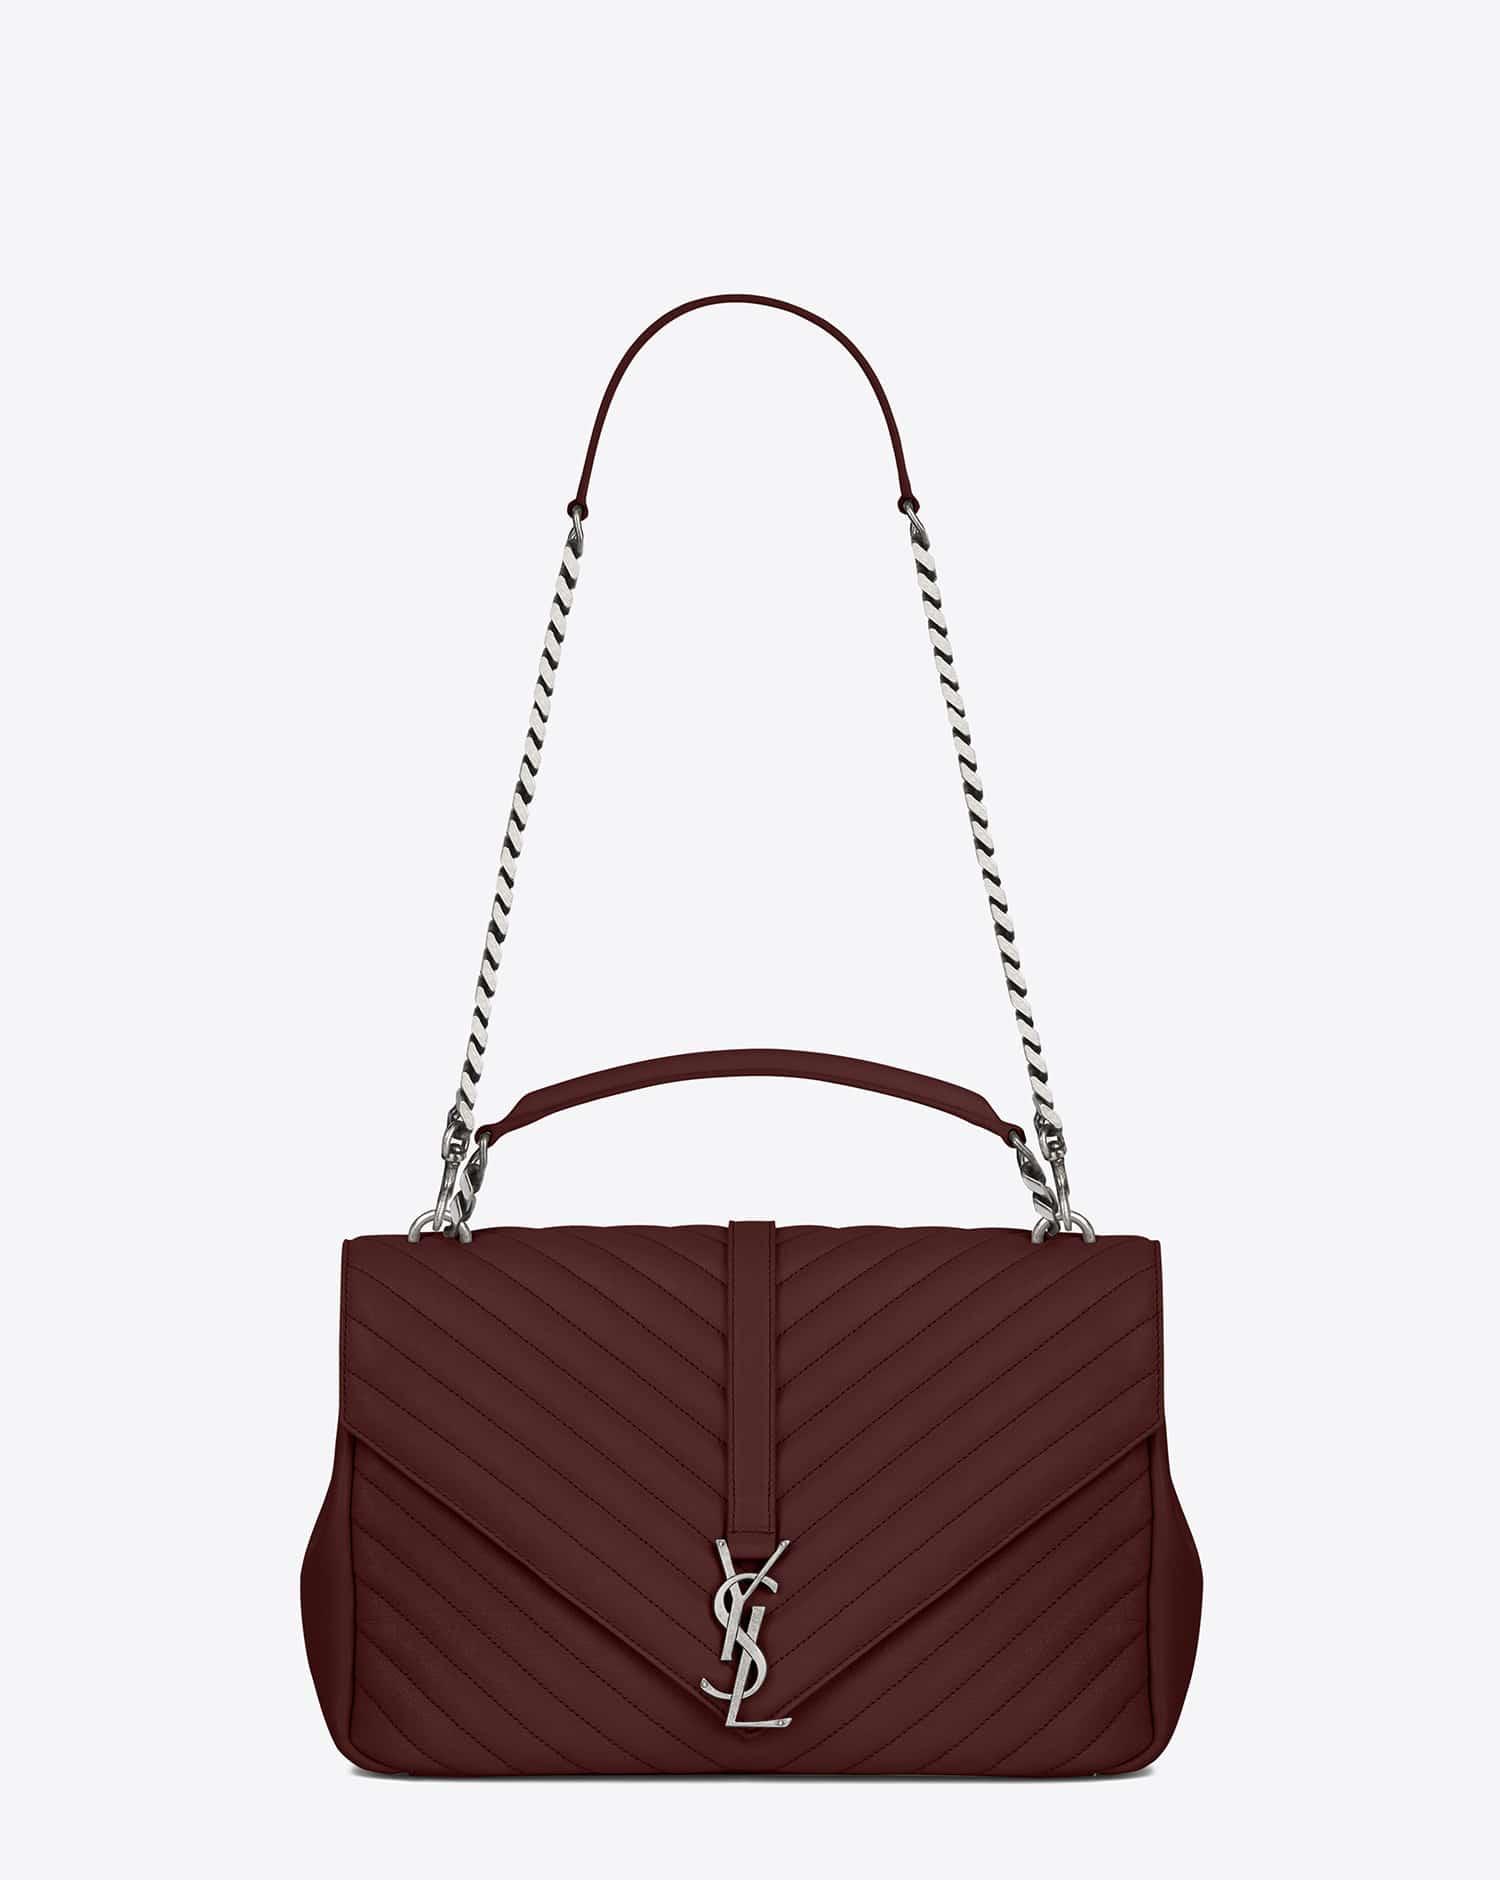 12d757828079 Saint Laurent Cruise 2017 Bag Collection – Spotted Fashion